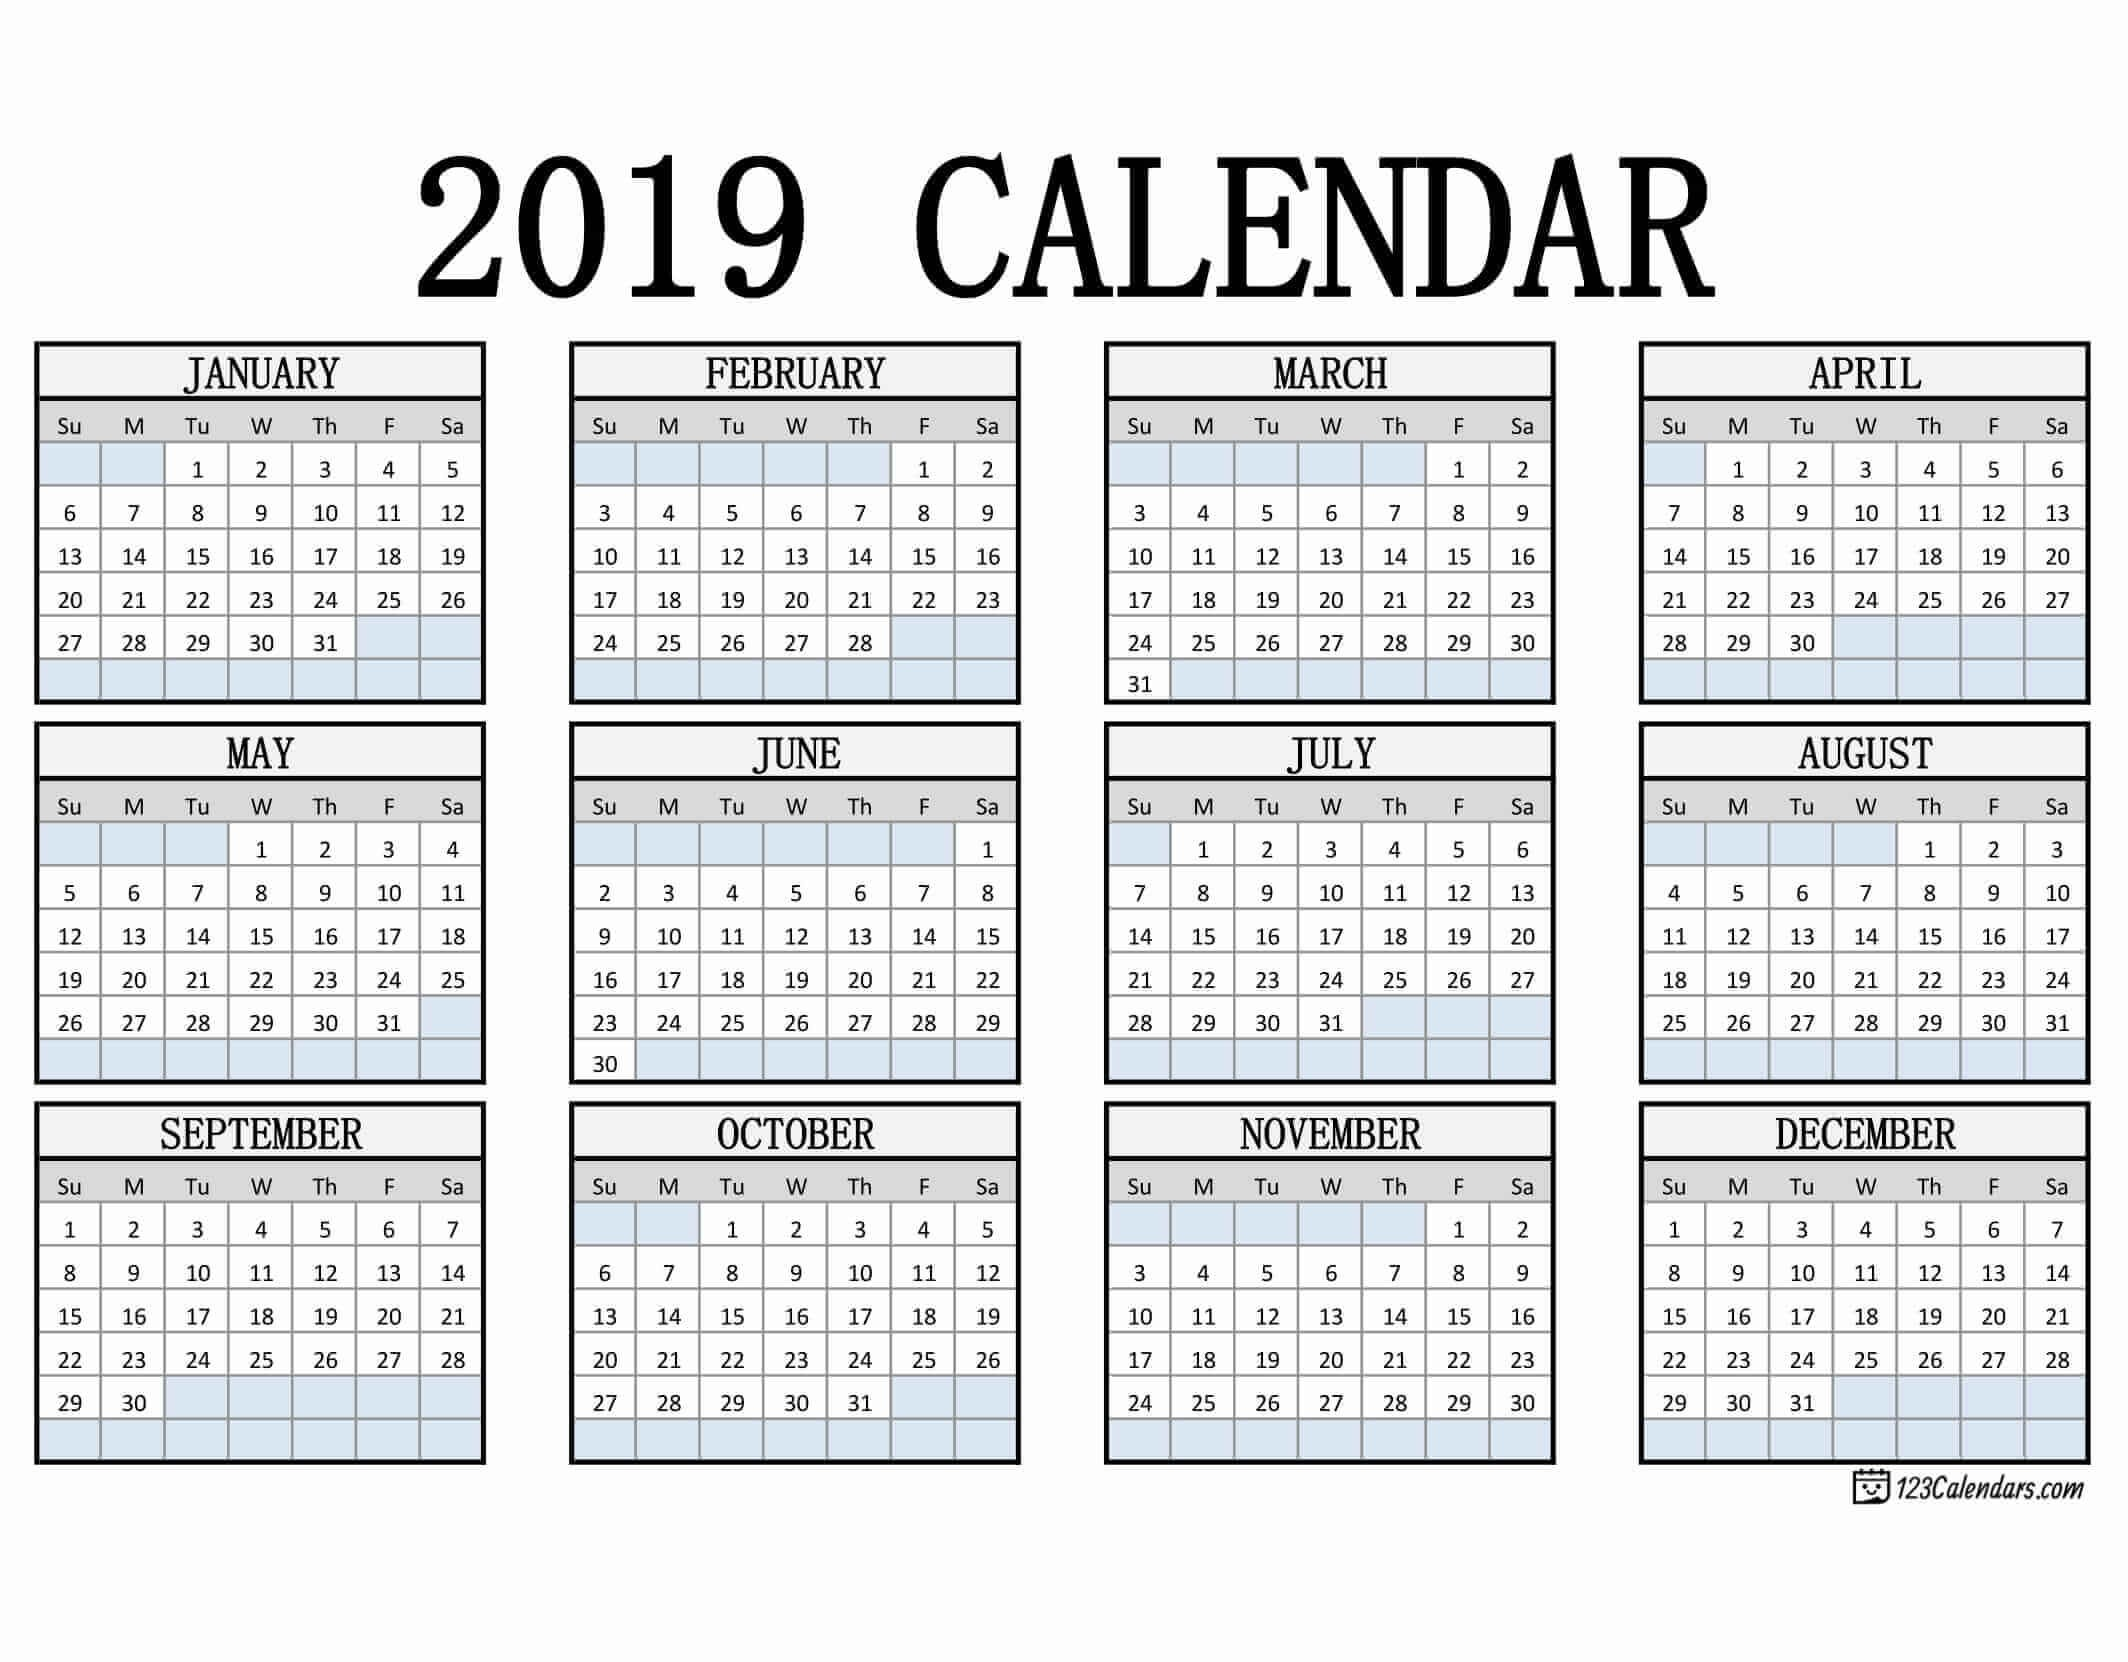 Printable Calendars 2019 2019 Printable Calendar 123calendars